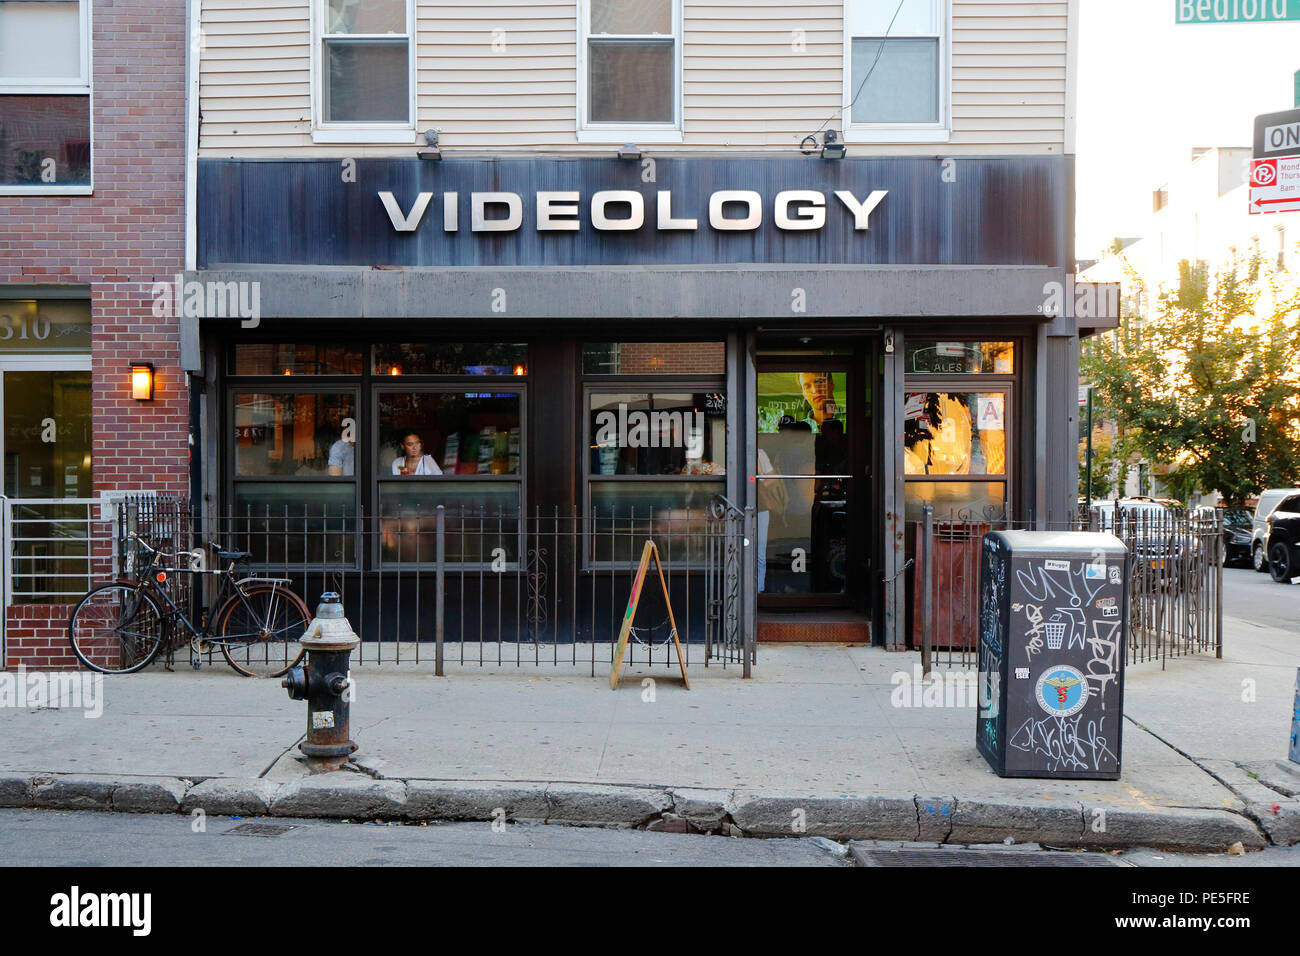 Videology, 308 Bedford Ave, Brooklyn, NY - Stock Image